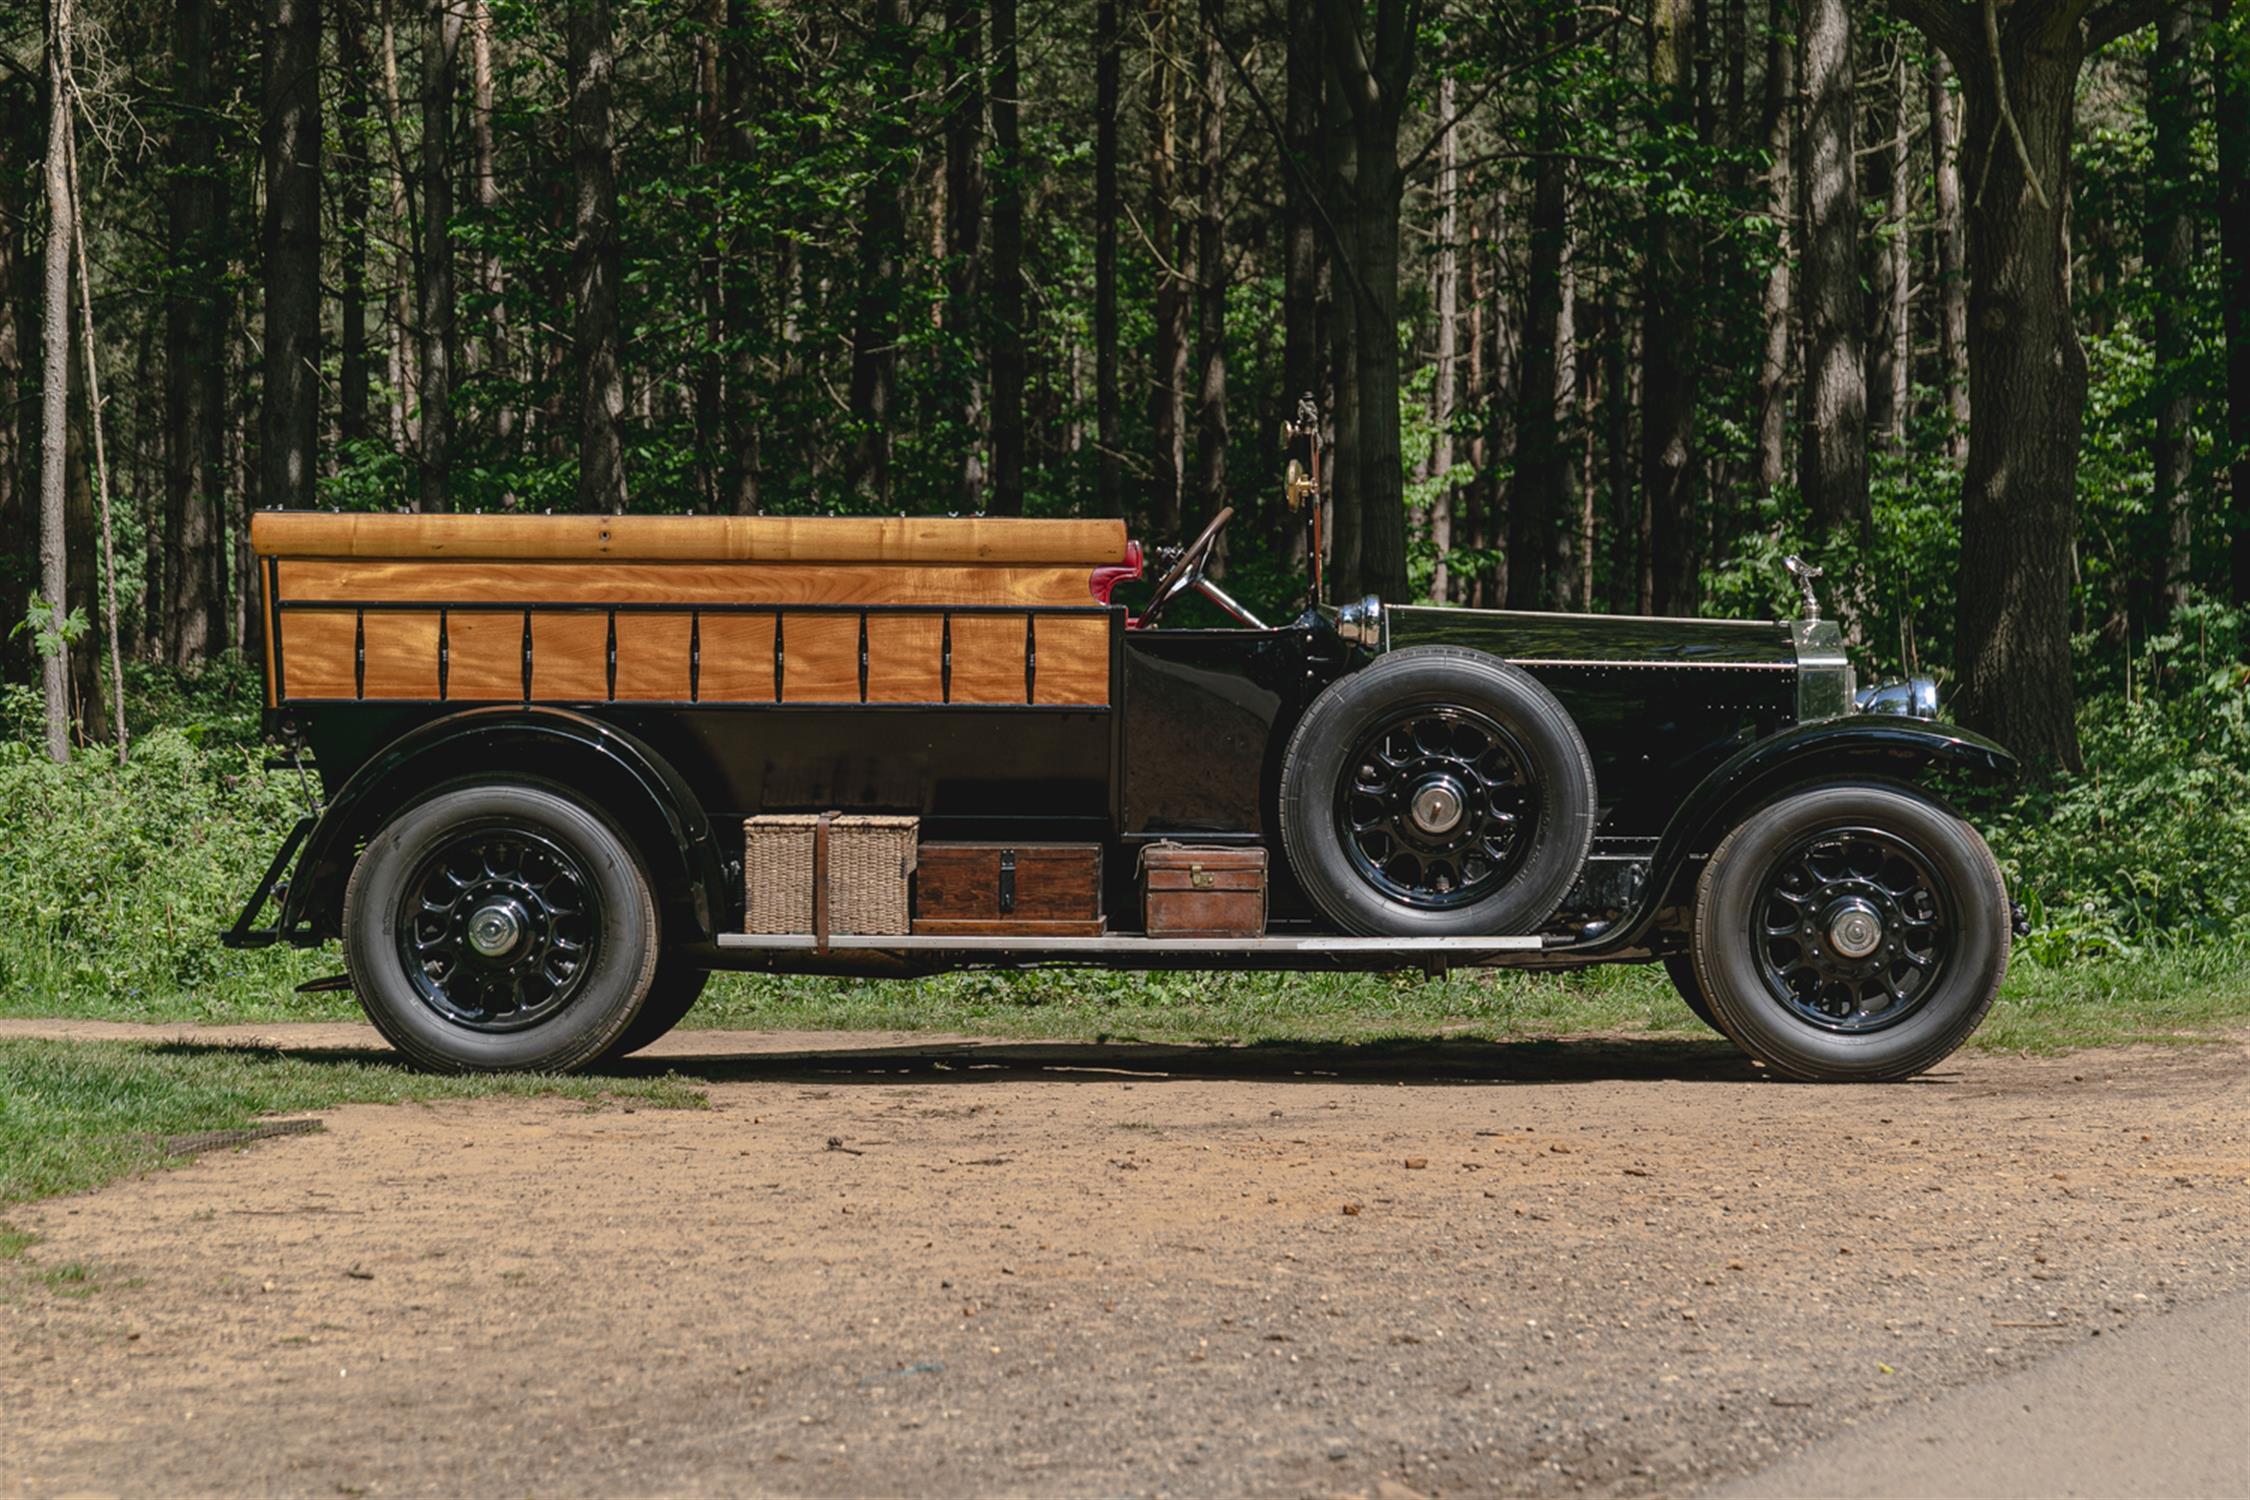 1927 Rolls-Royce Phantom 1 Open Tourer - Image 5 of 10